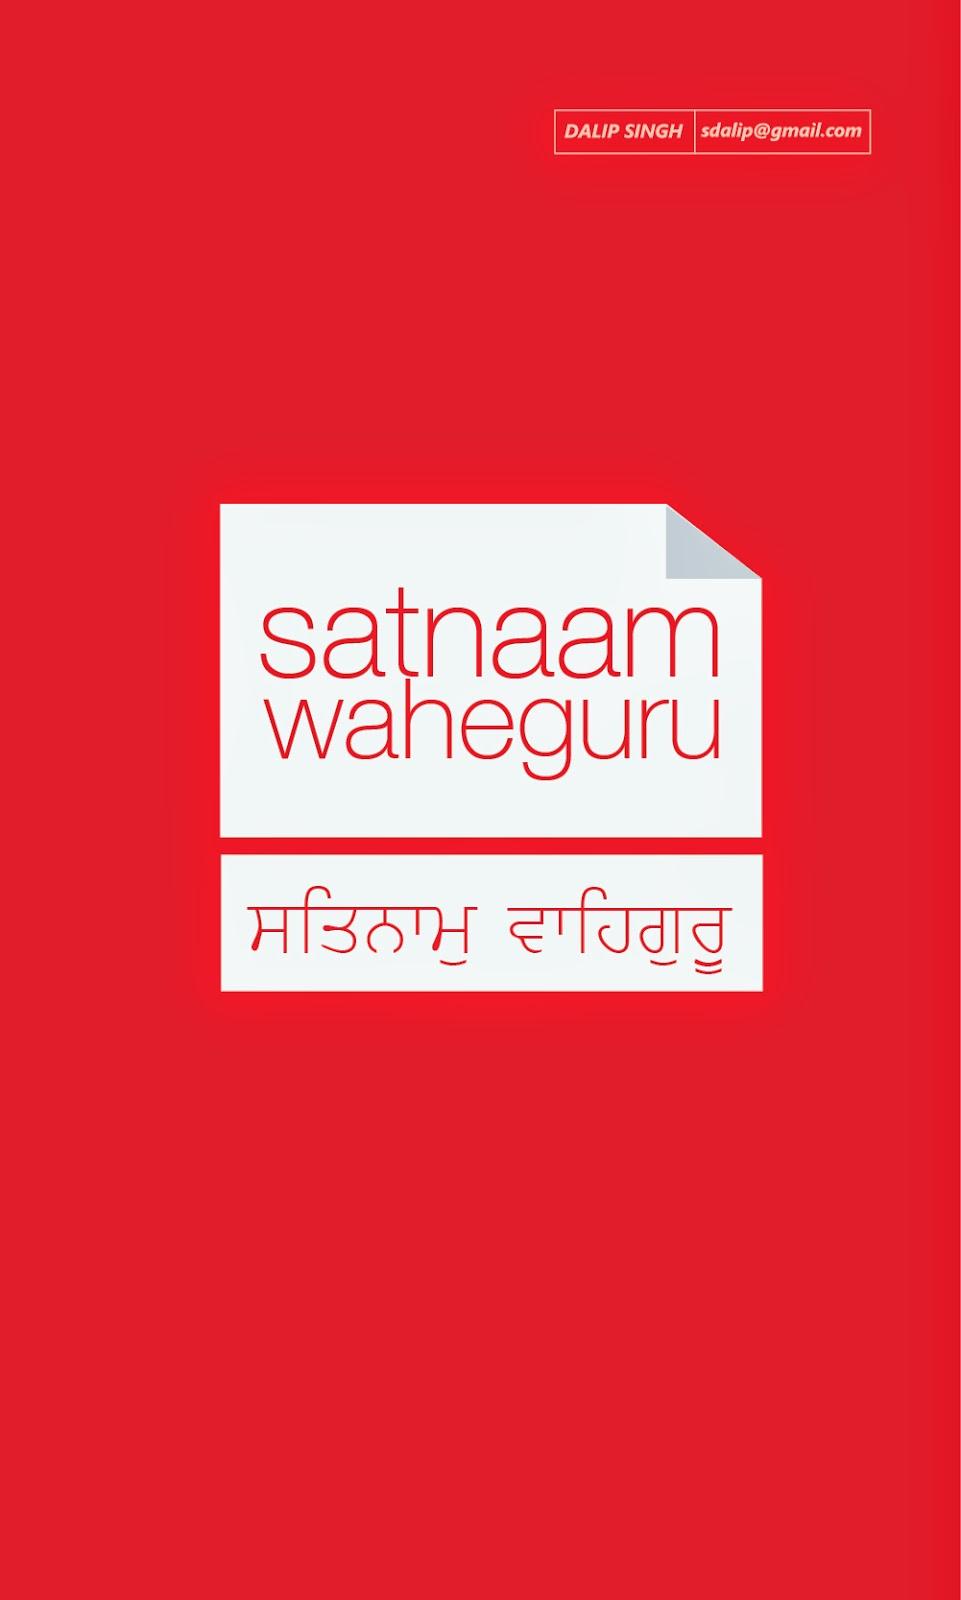 Satnaam Waheguru (Mobile Phone Wallpapers) | allaboutsikhi